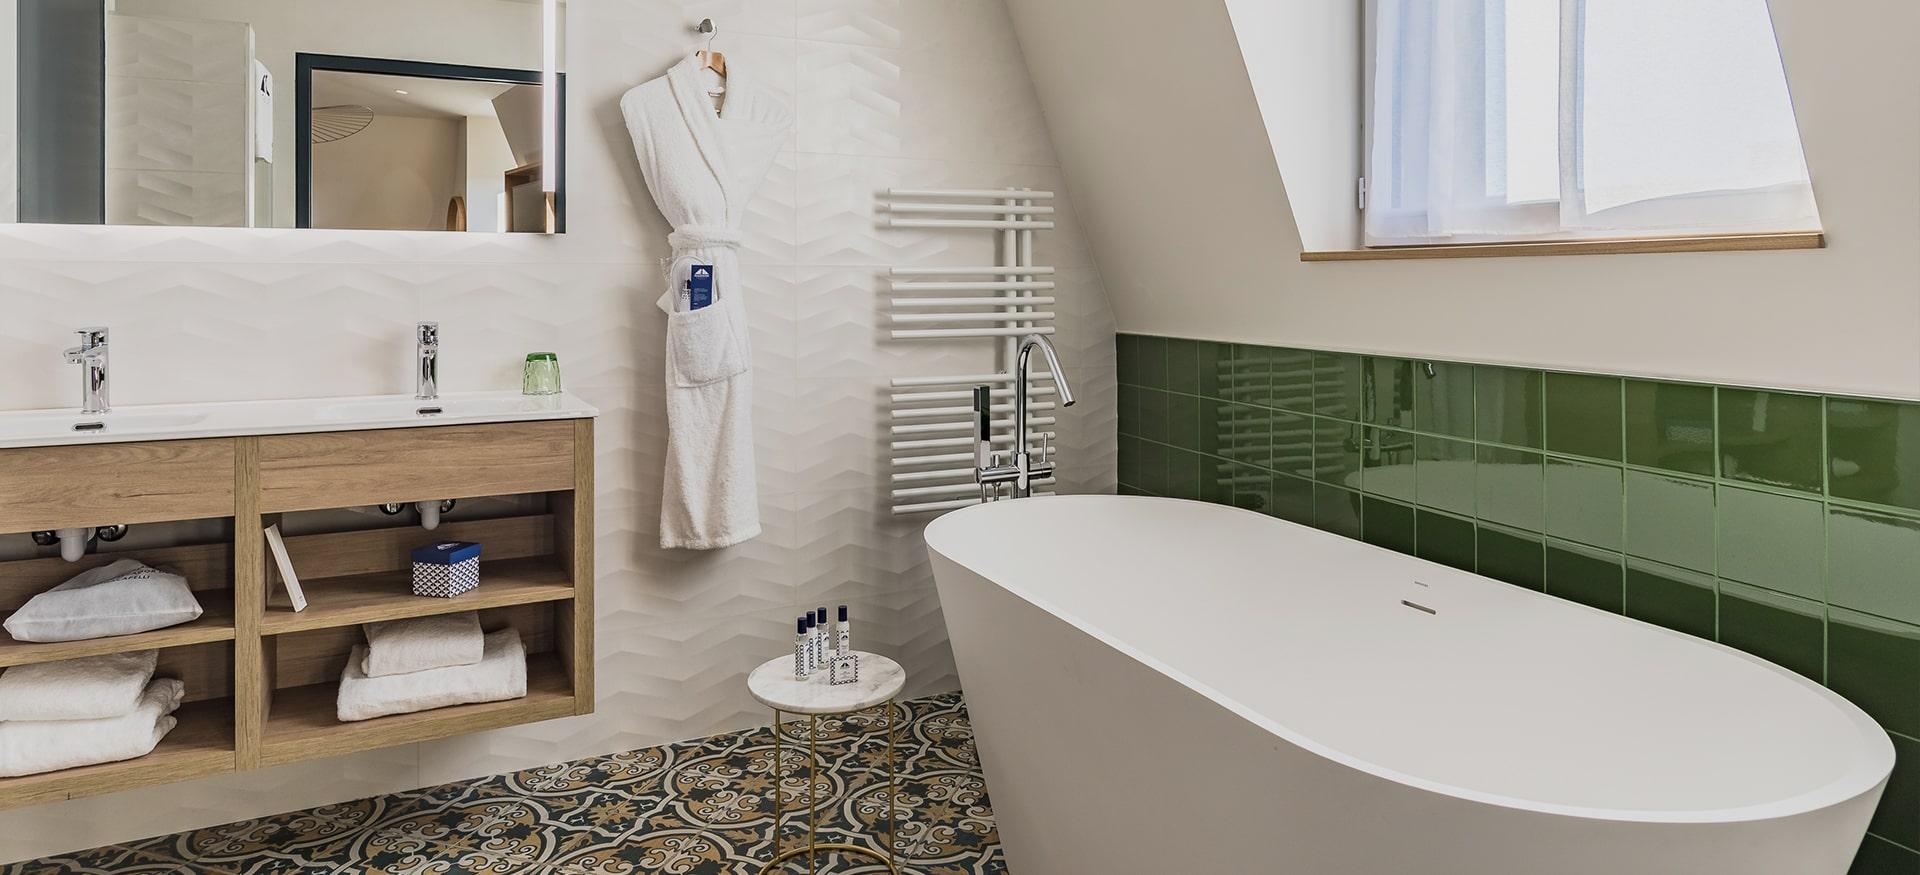 Buy Bath Linen Online See The Jean Vier Range Of Basque Linen Bath Sheet Bath Towel Wash Gloves Bathroom Towel